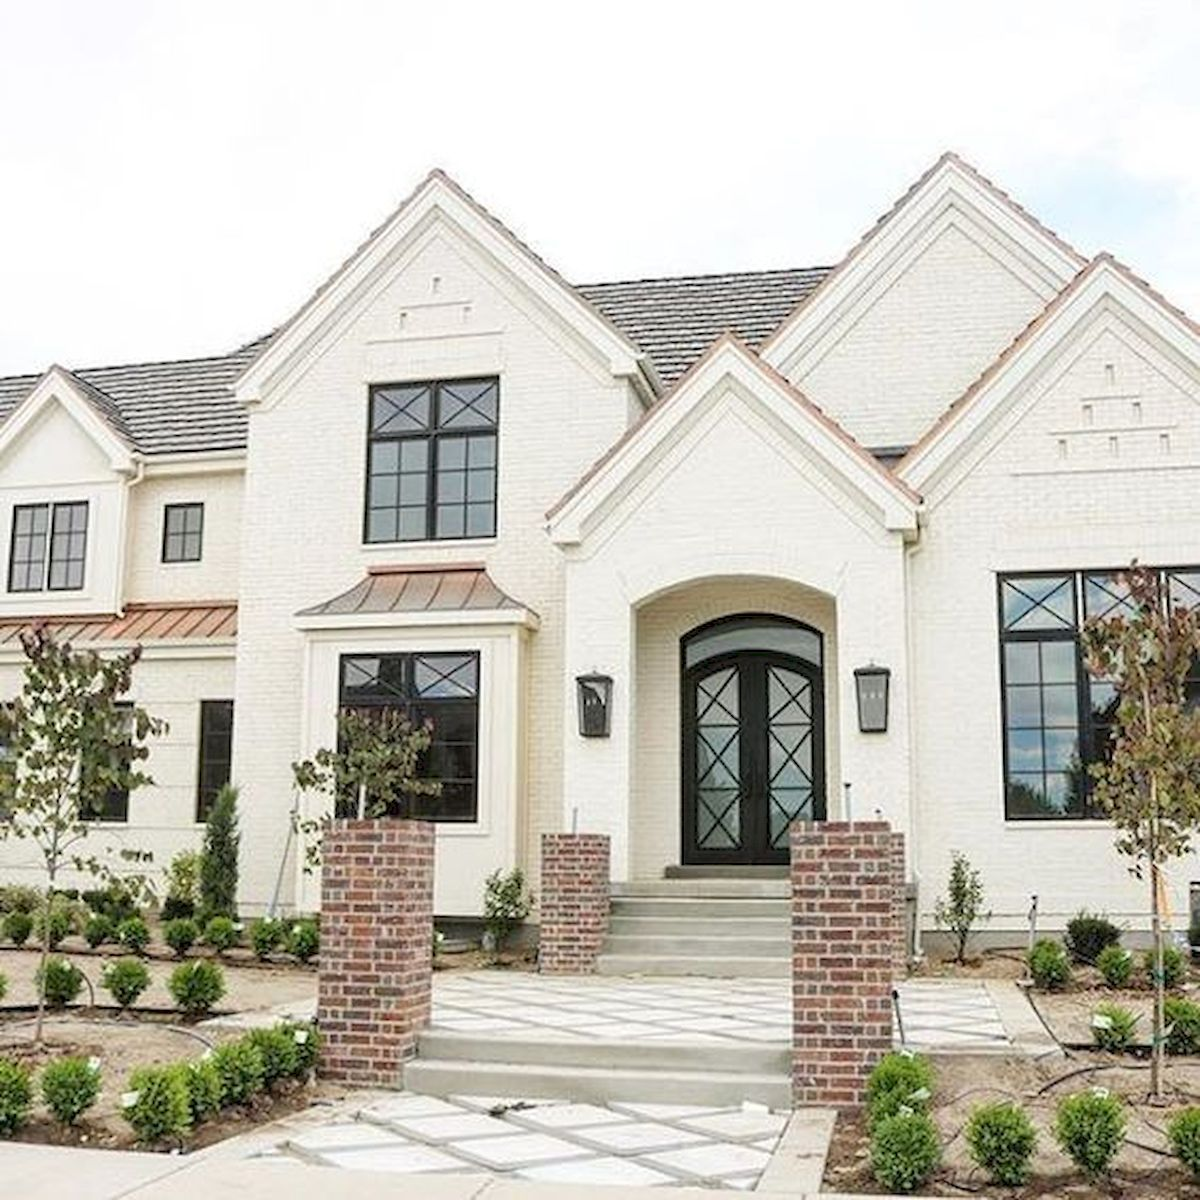 Adorable best modern farmhouse exterior house plans design ideas trend in source https also home decor idea designs rh pinterest